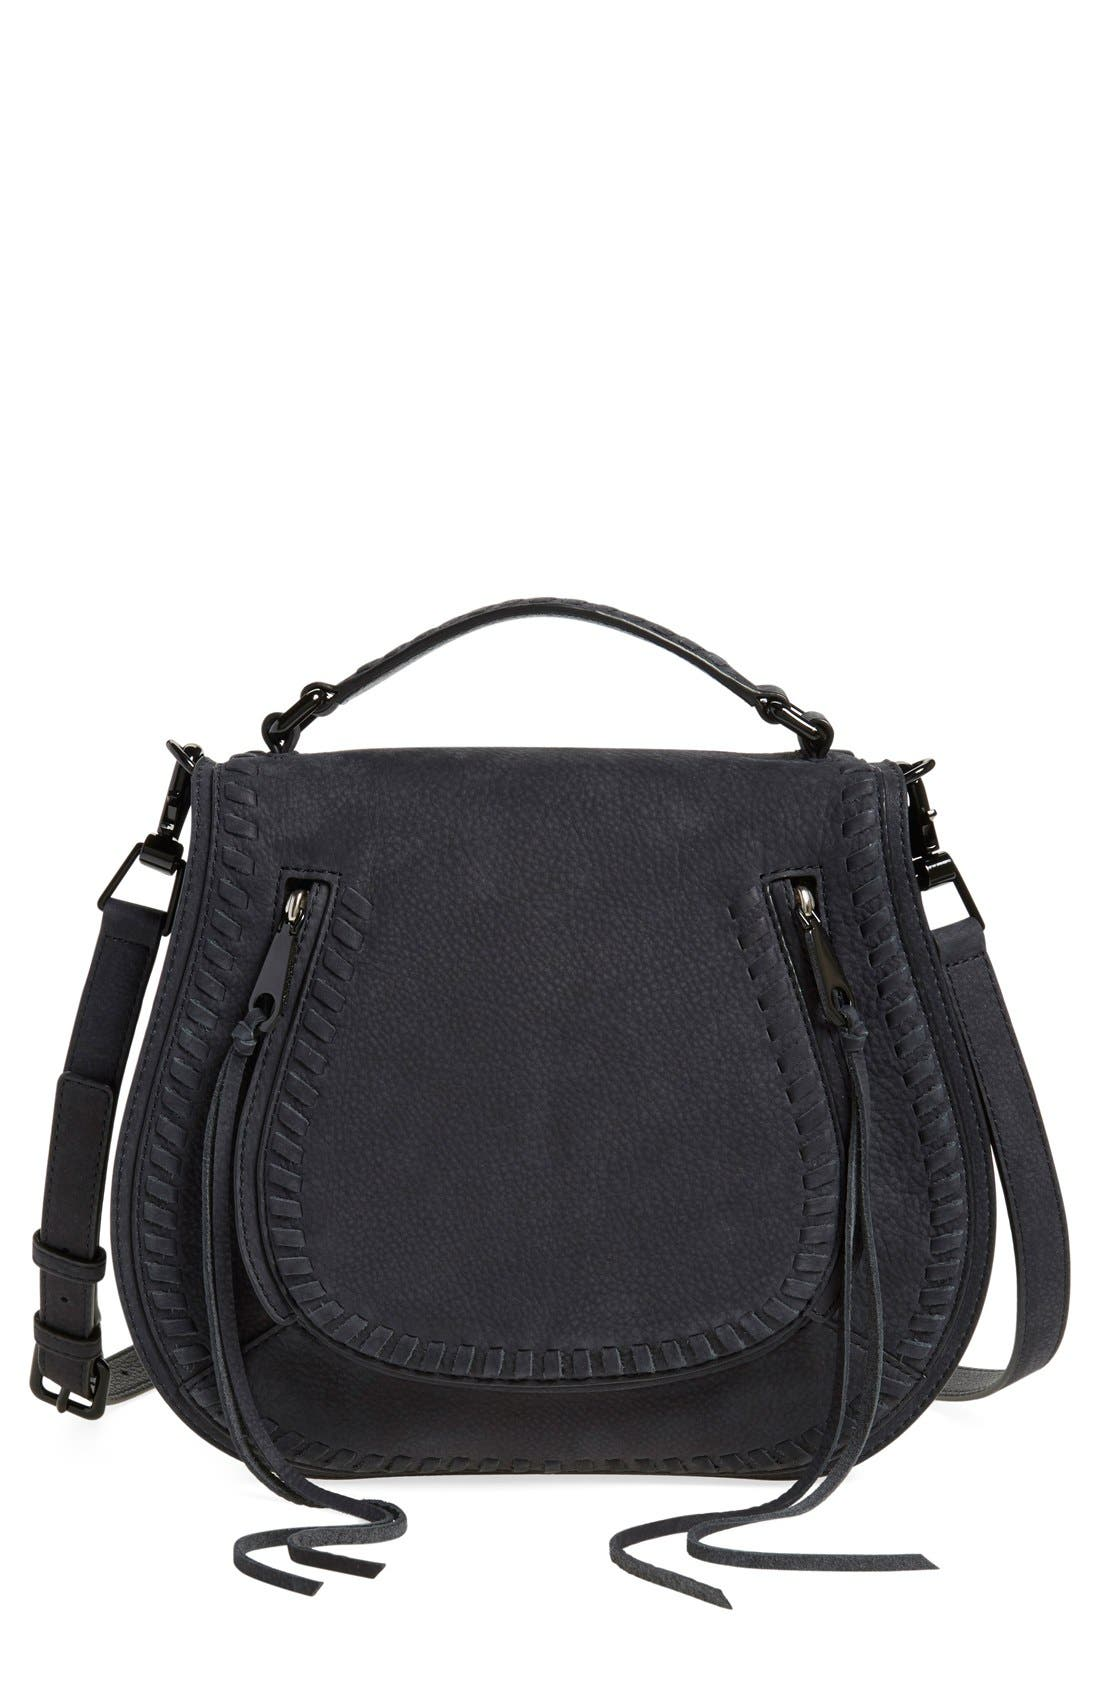 REBECCA MINKOFF Vanity Saddle Bag, Main, color, 001